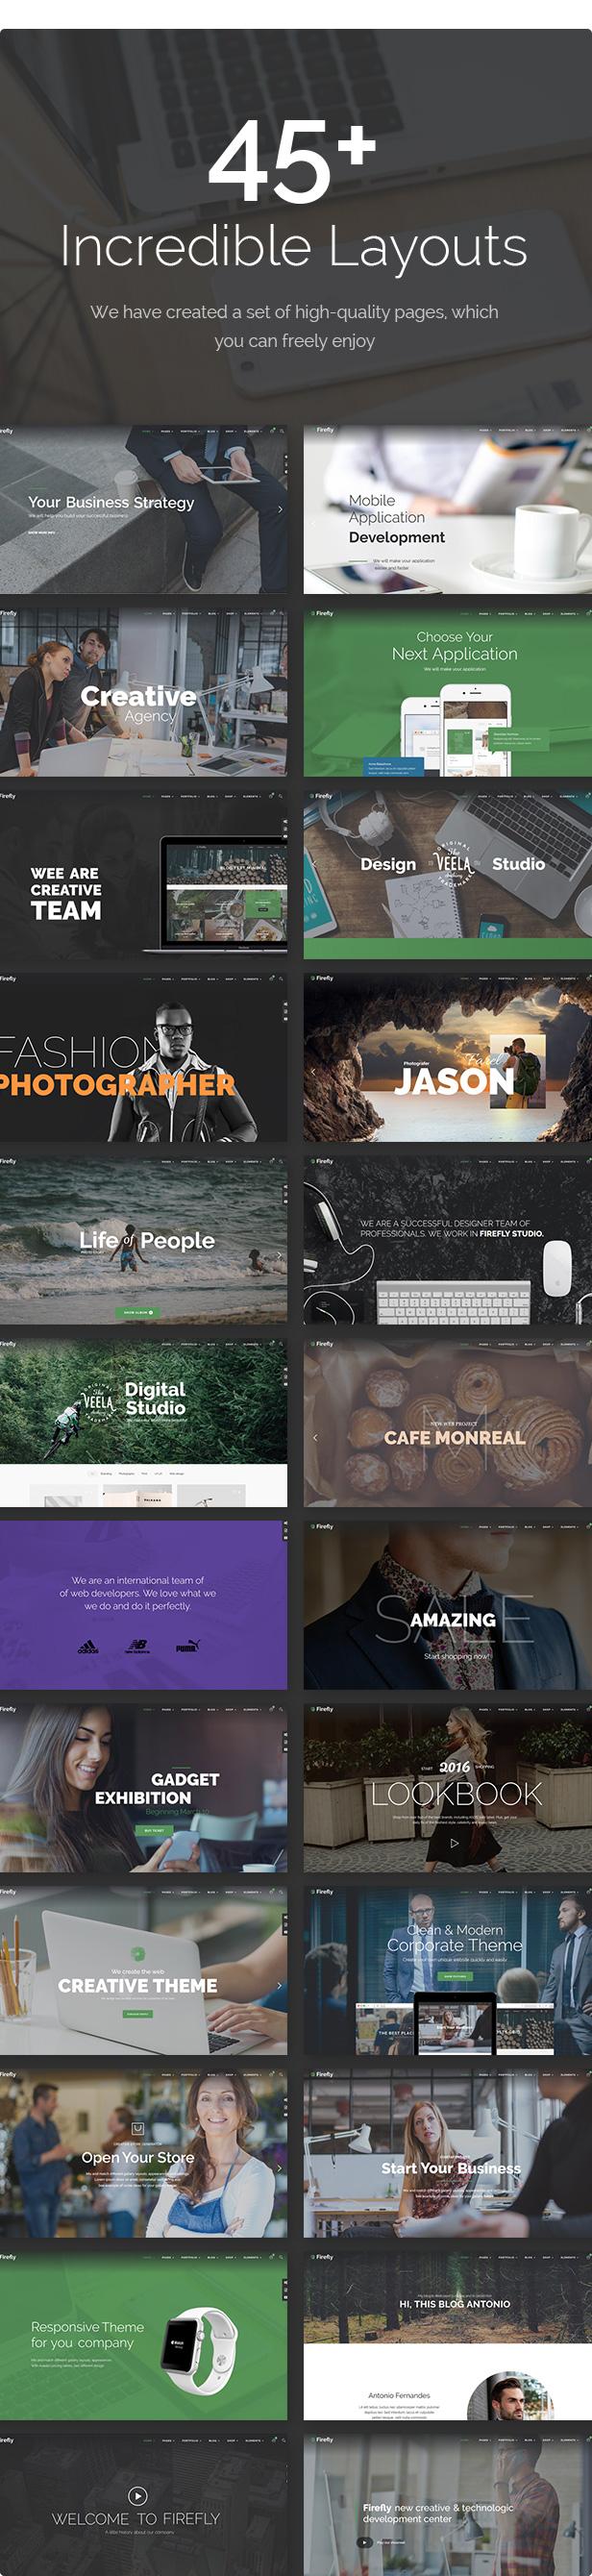 Firefly - Responsive Multi-Purpose WordPress Theme - 13